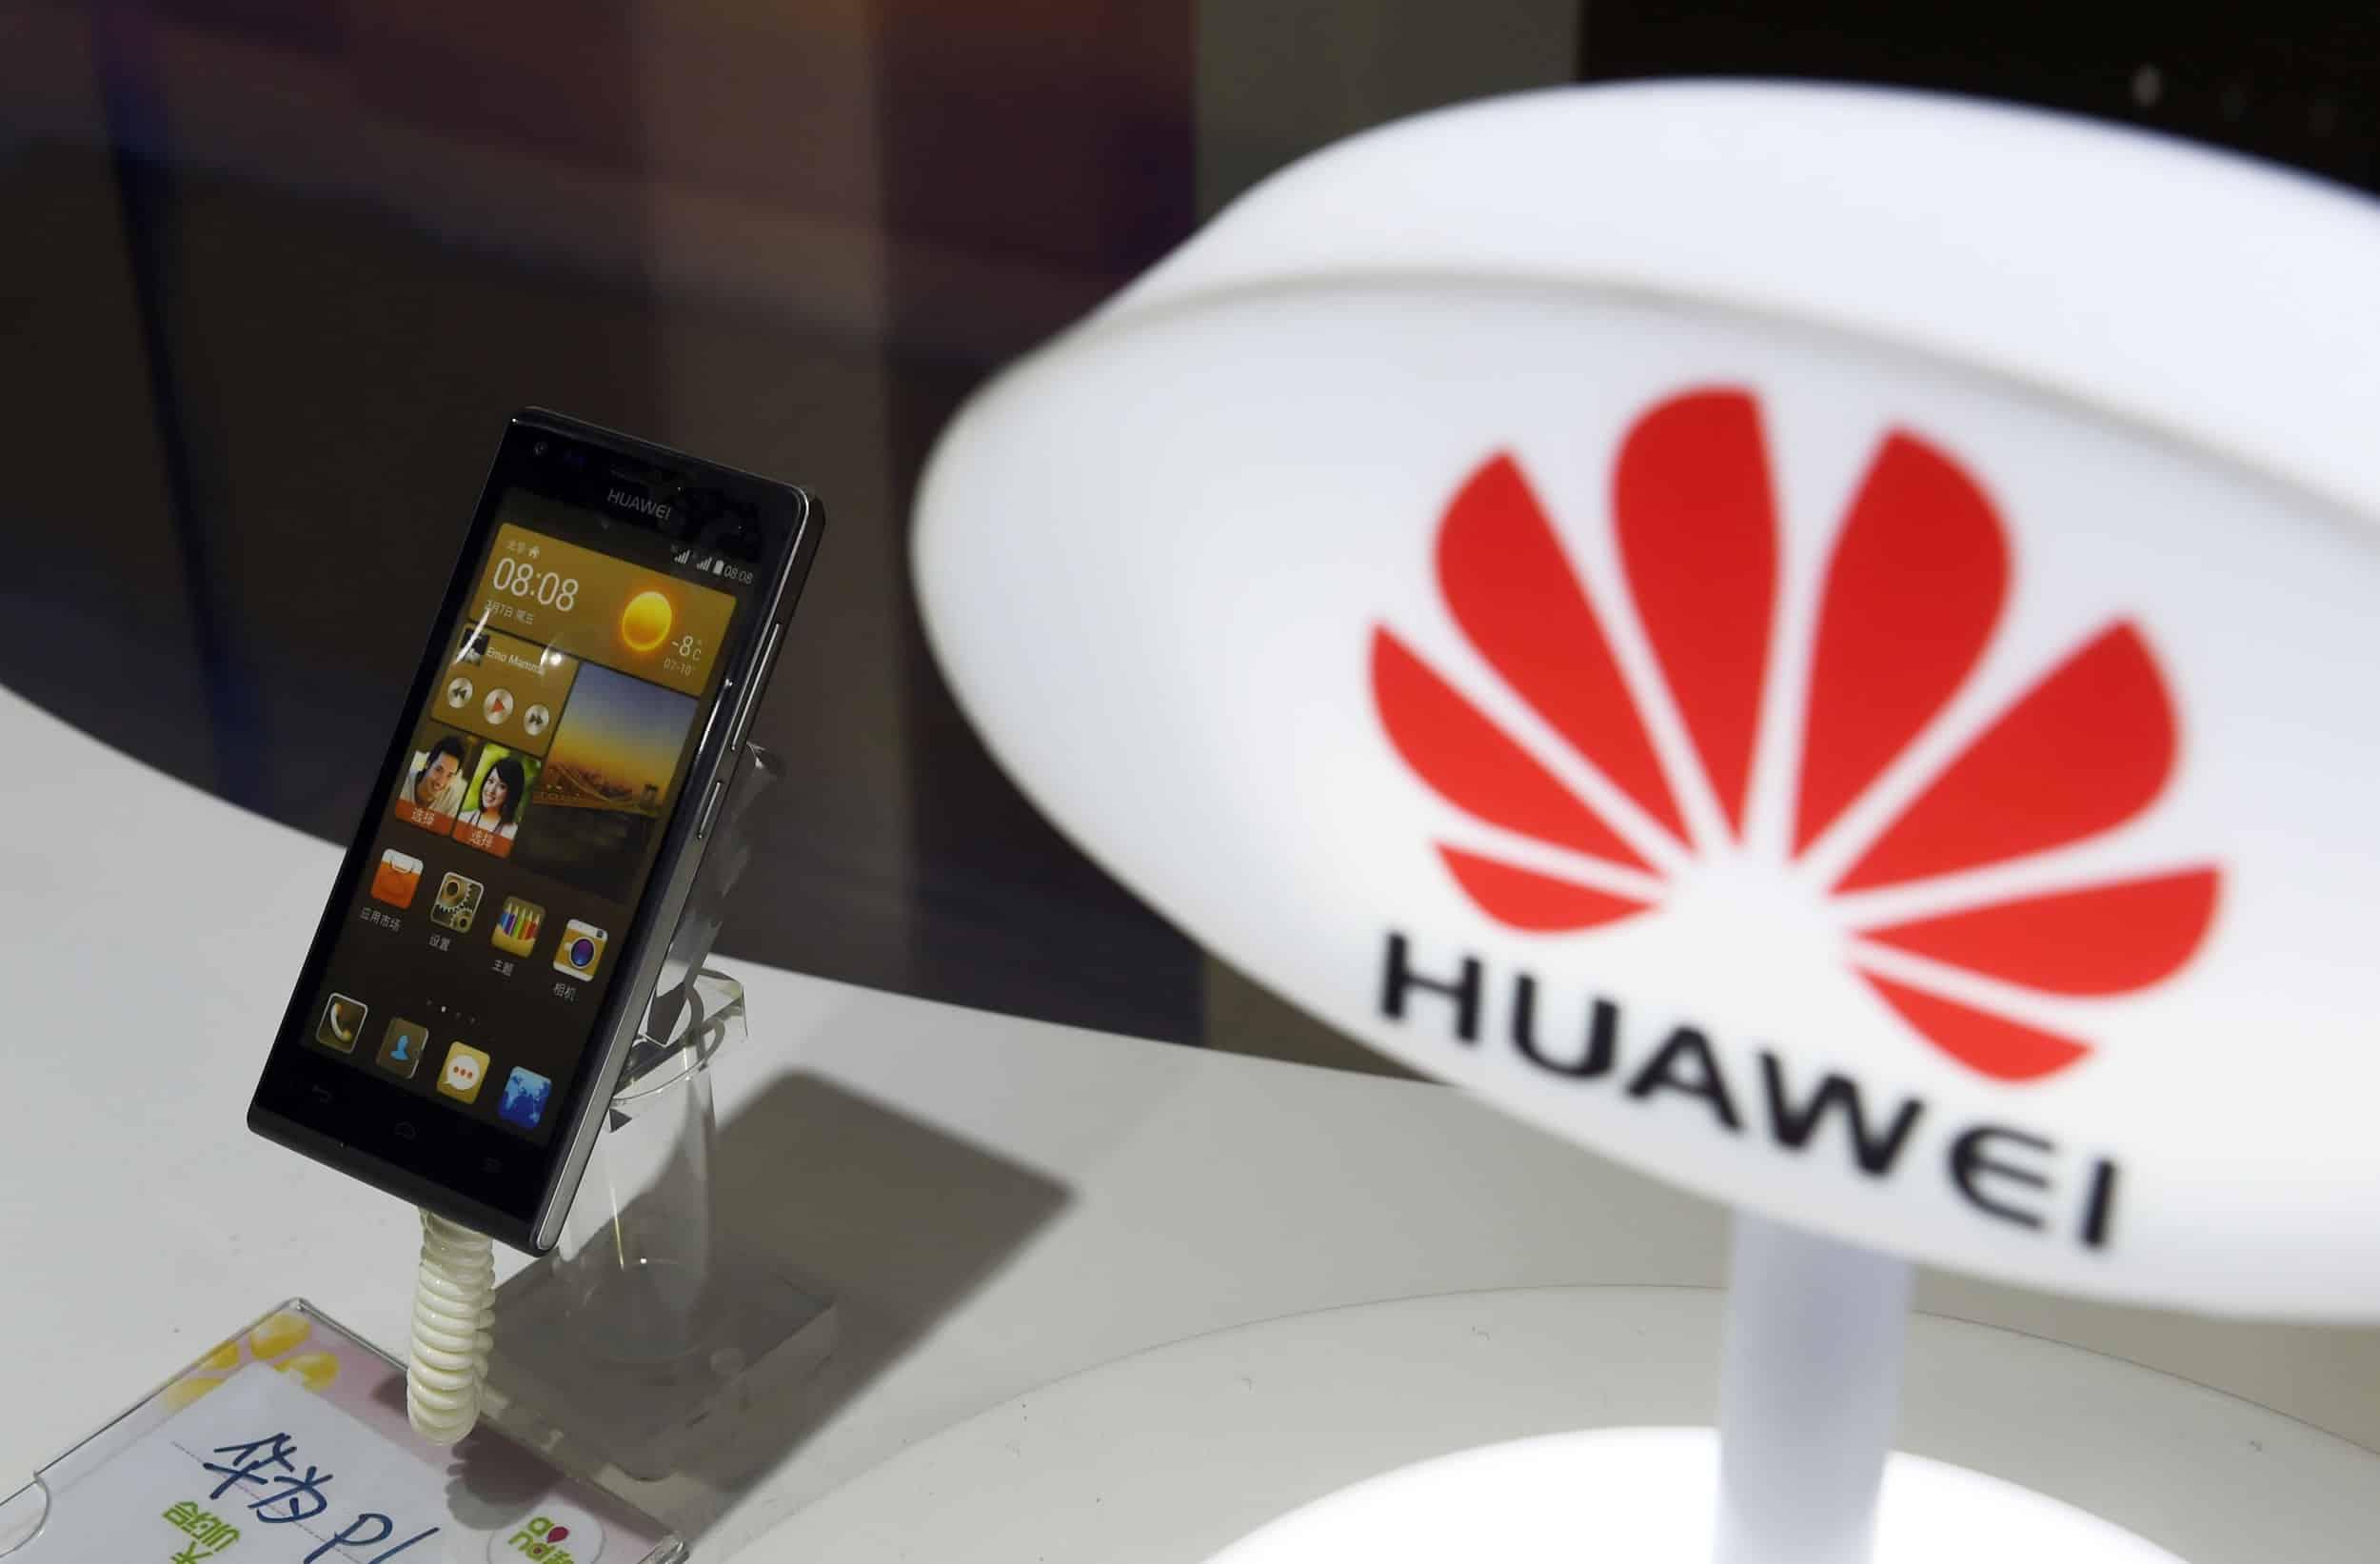 Celular Huawei.